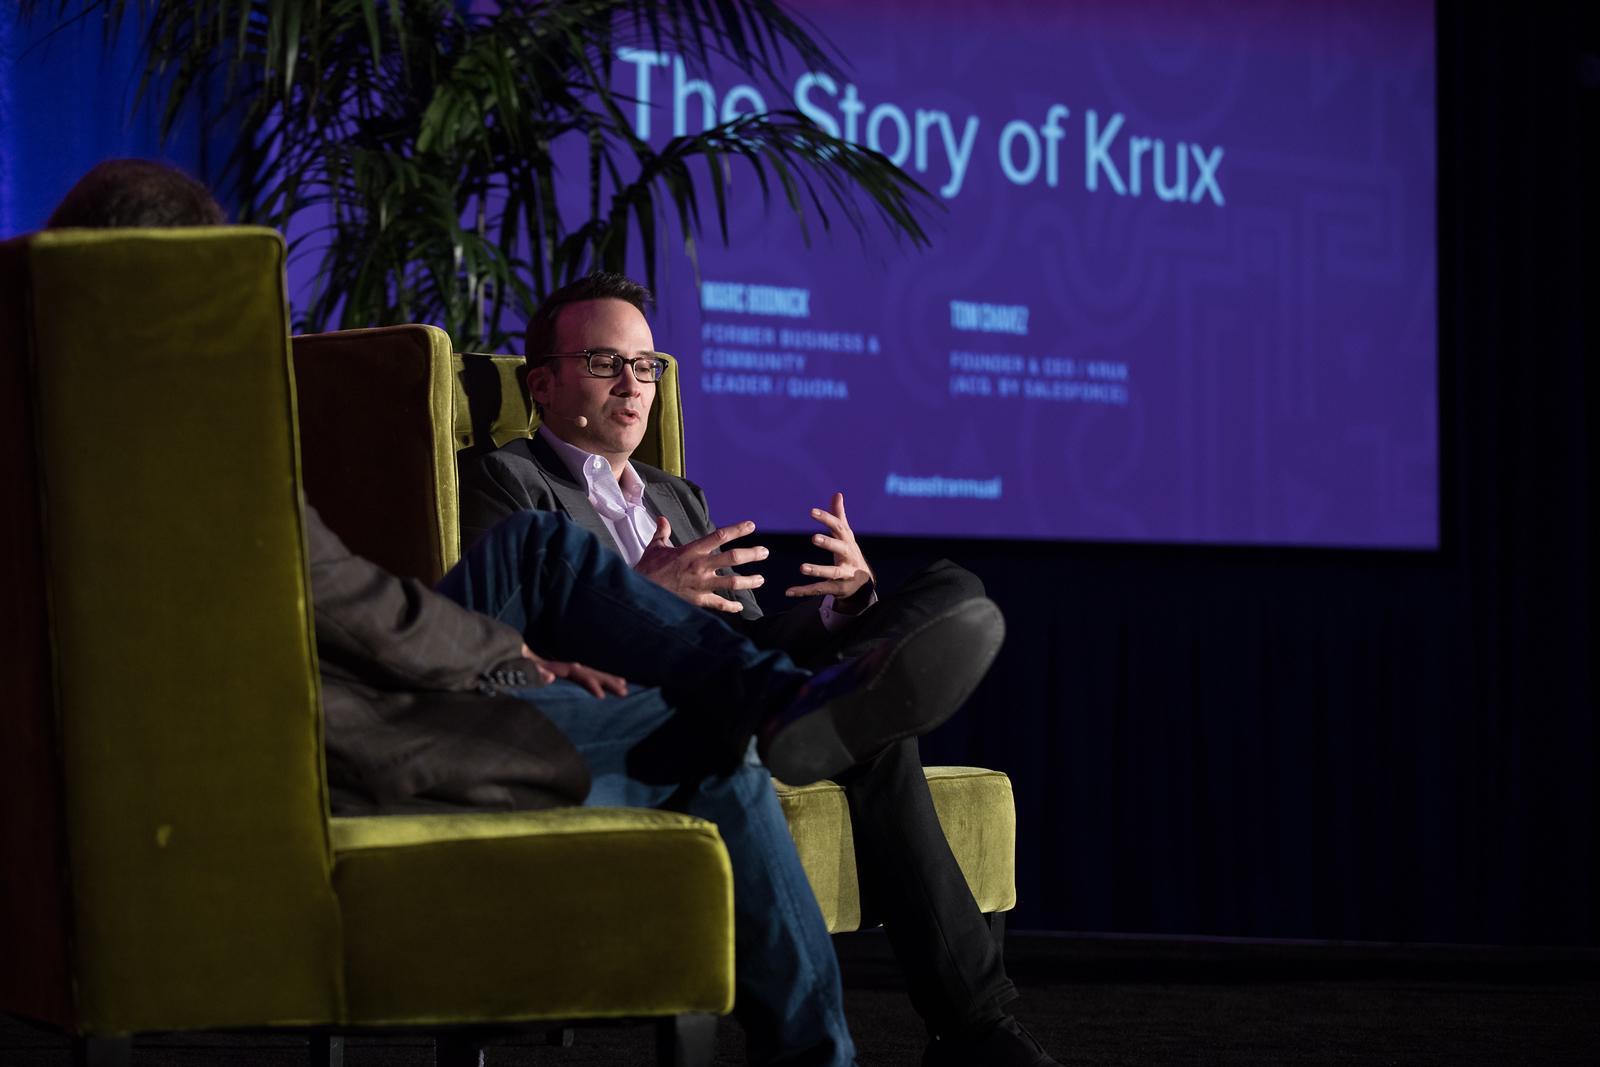 The Story of Krux Marc Bodnick FORMER BUSINESS & COMMUNITY LEADER / QUORA Tom Chavez FOUNDER & CEO / KRUX (ACQ. BY SALESFORCE